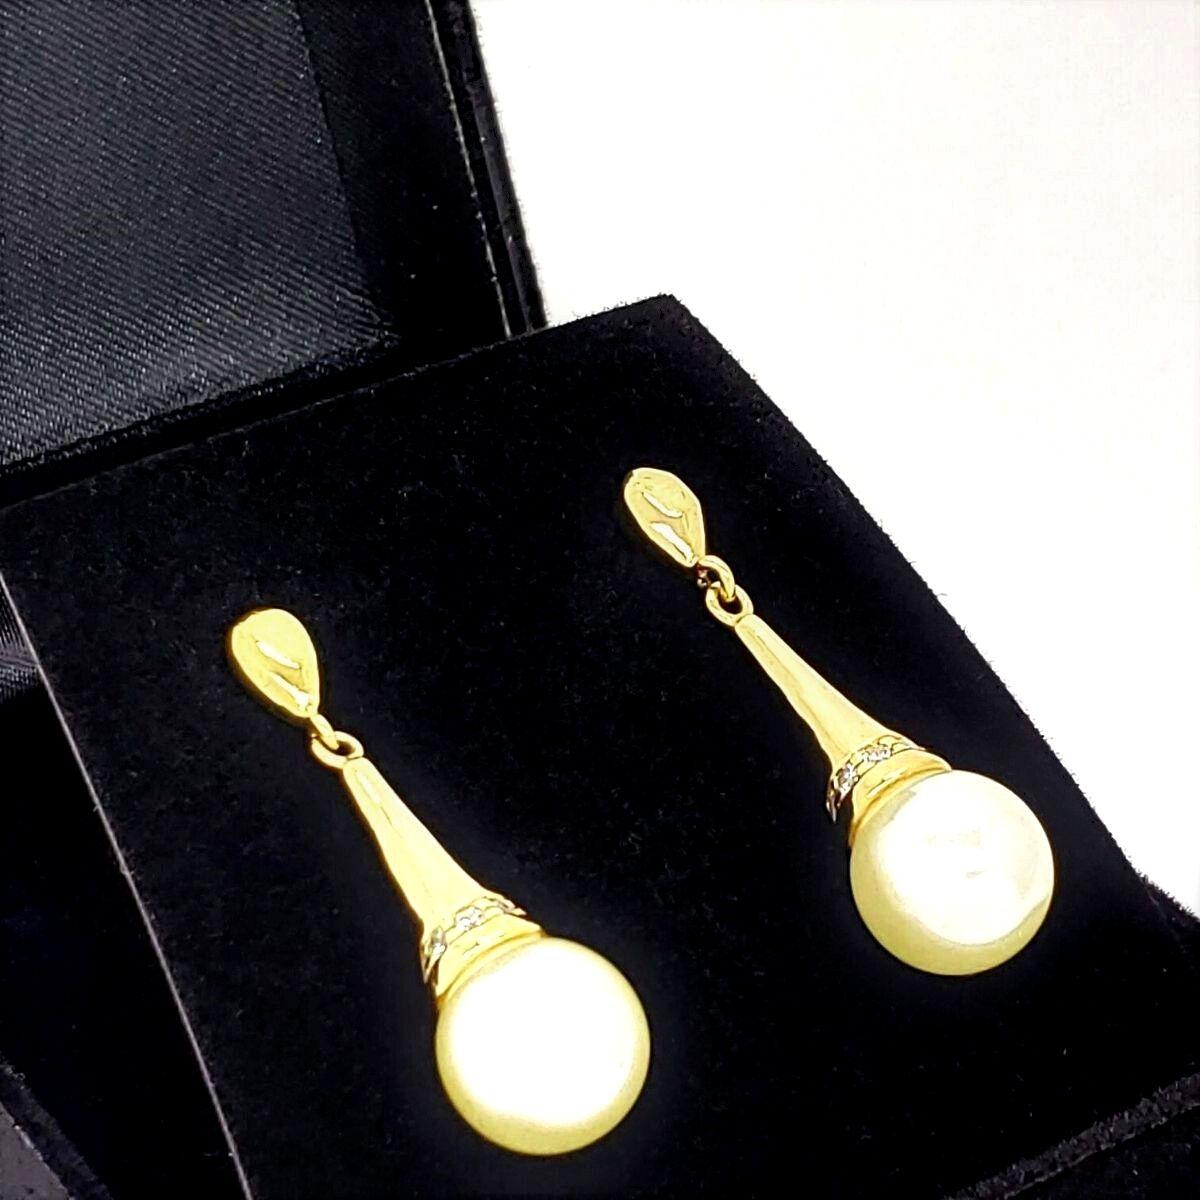 Brincos Pérolas Cone Cravejado De Zirconias Banho Ouro 18k 2142